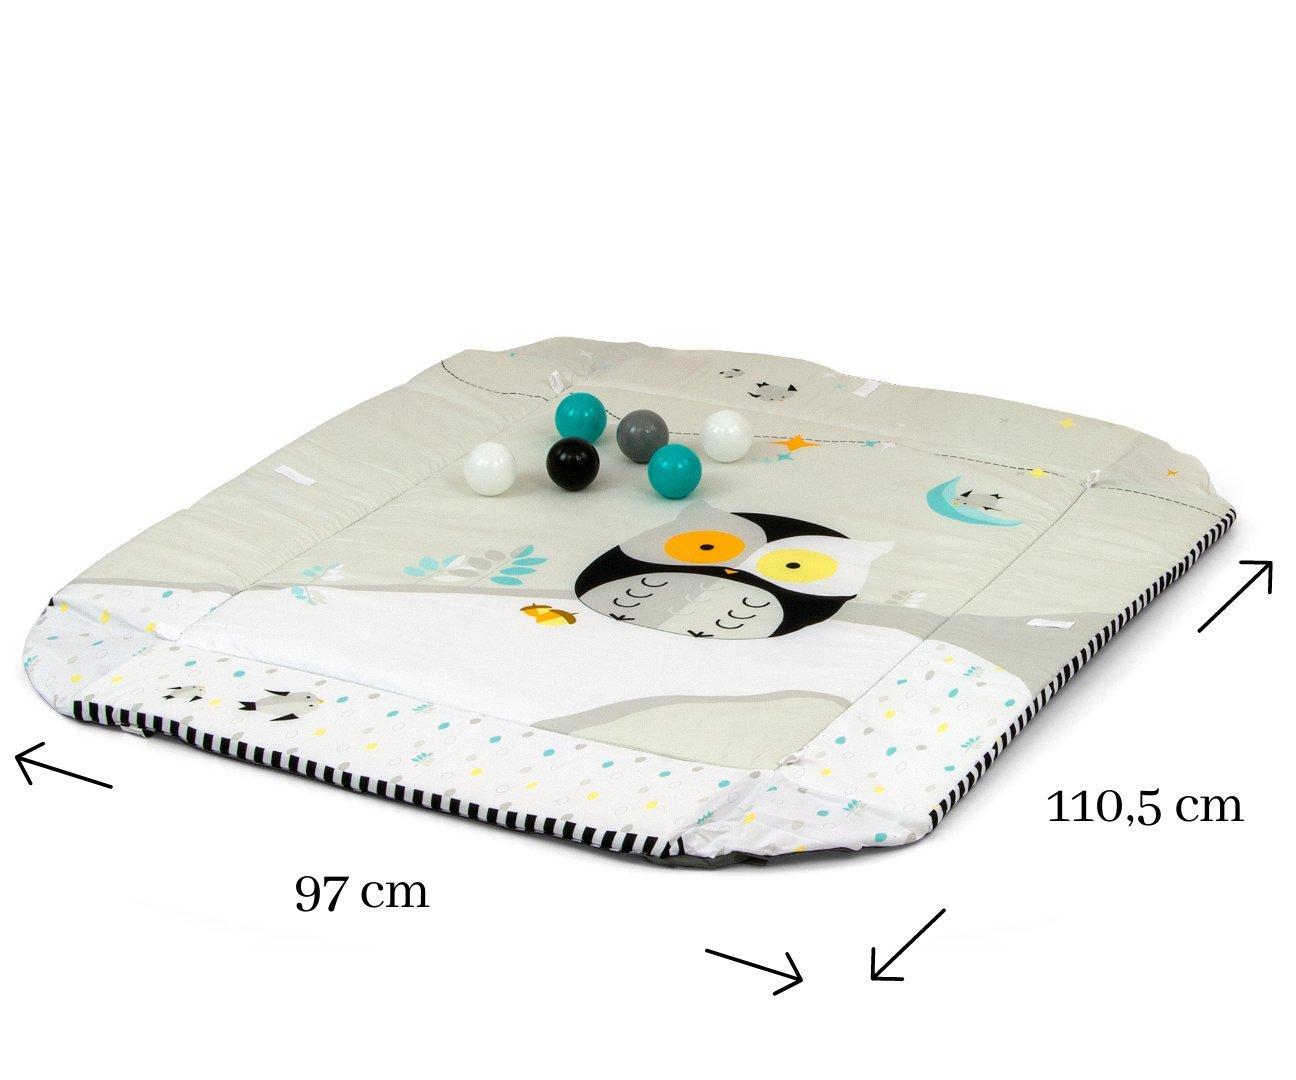 Hracia deka s ohr�dkou 5v1 sova - zv��i� obr�zok